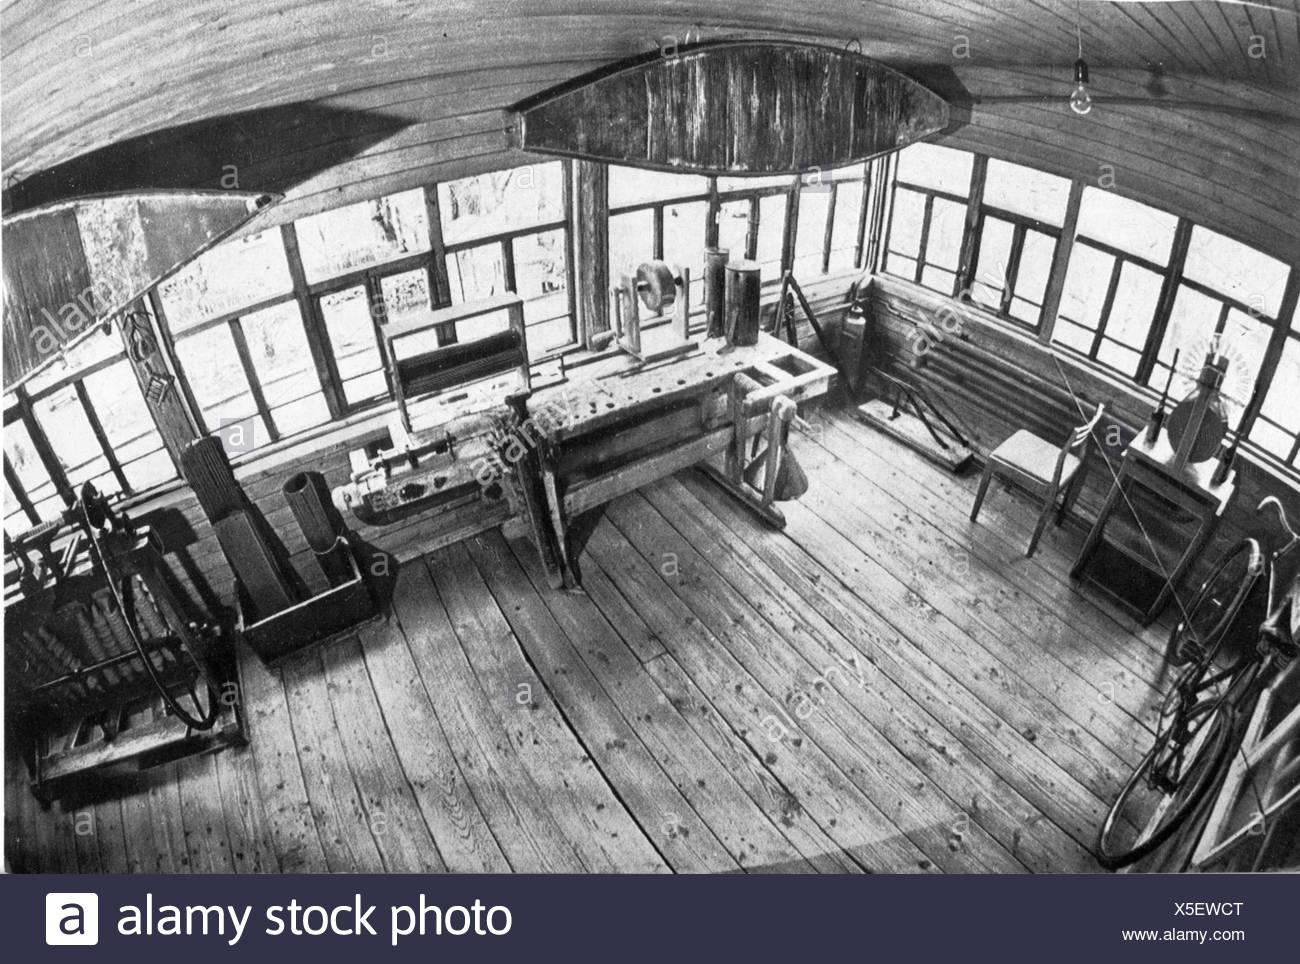 Tsiolkovskii, Konstantin Eduardovich, 17.9.1857 - 19.9.1935, physicien russe, mathématicien, son atelier, Banque D'Images